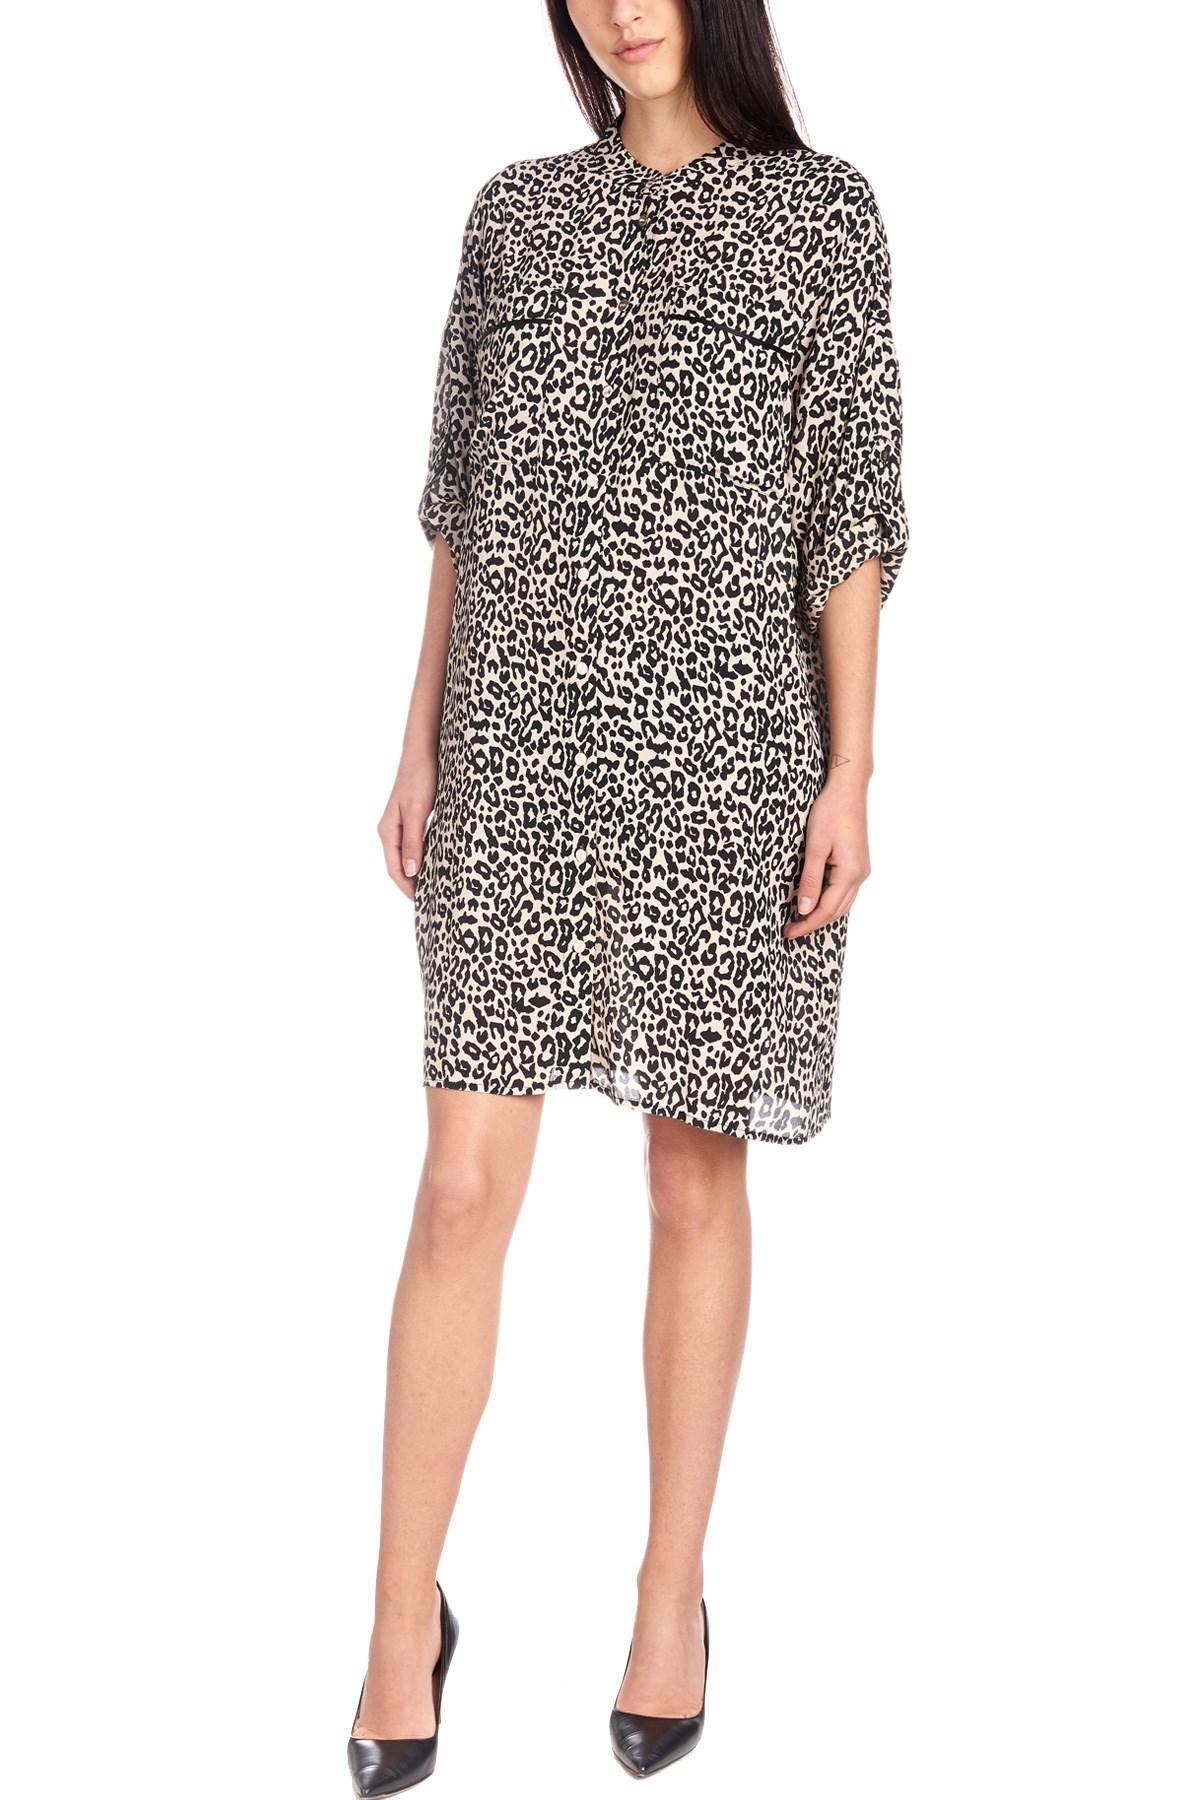 761e89ad5b Liu Jo. Women's Animalier Dress